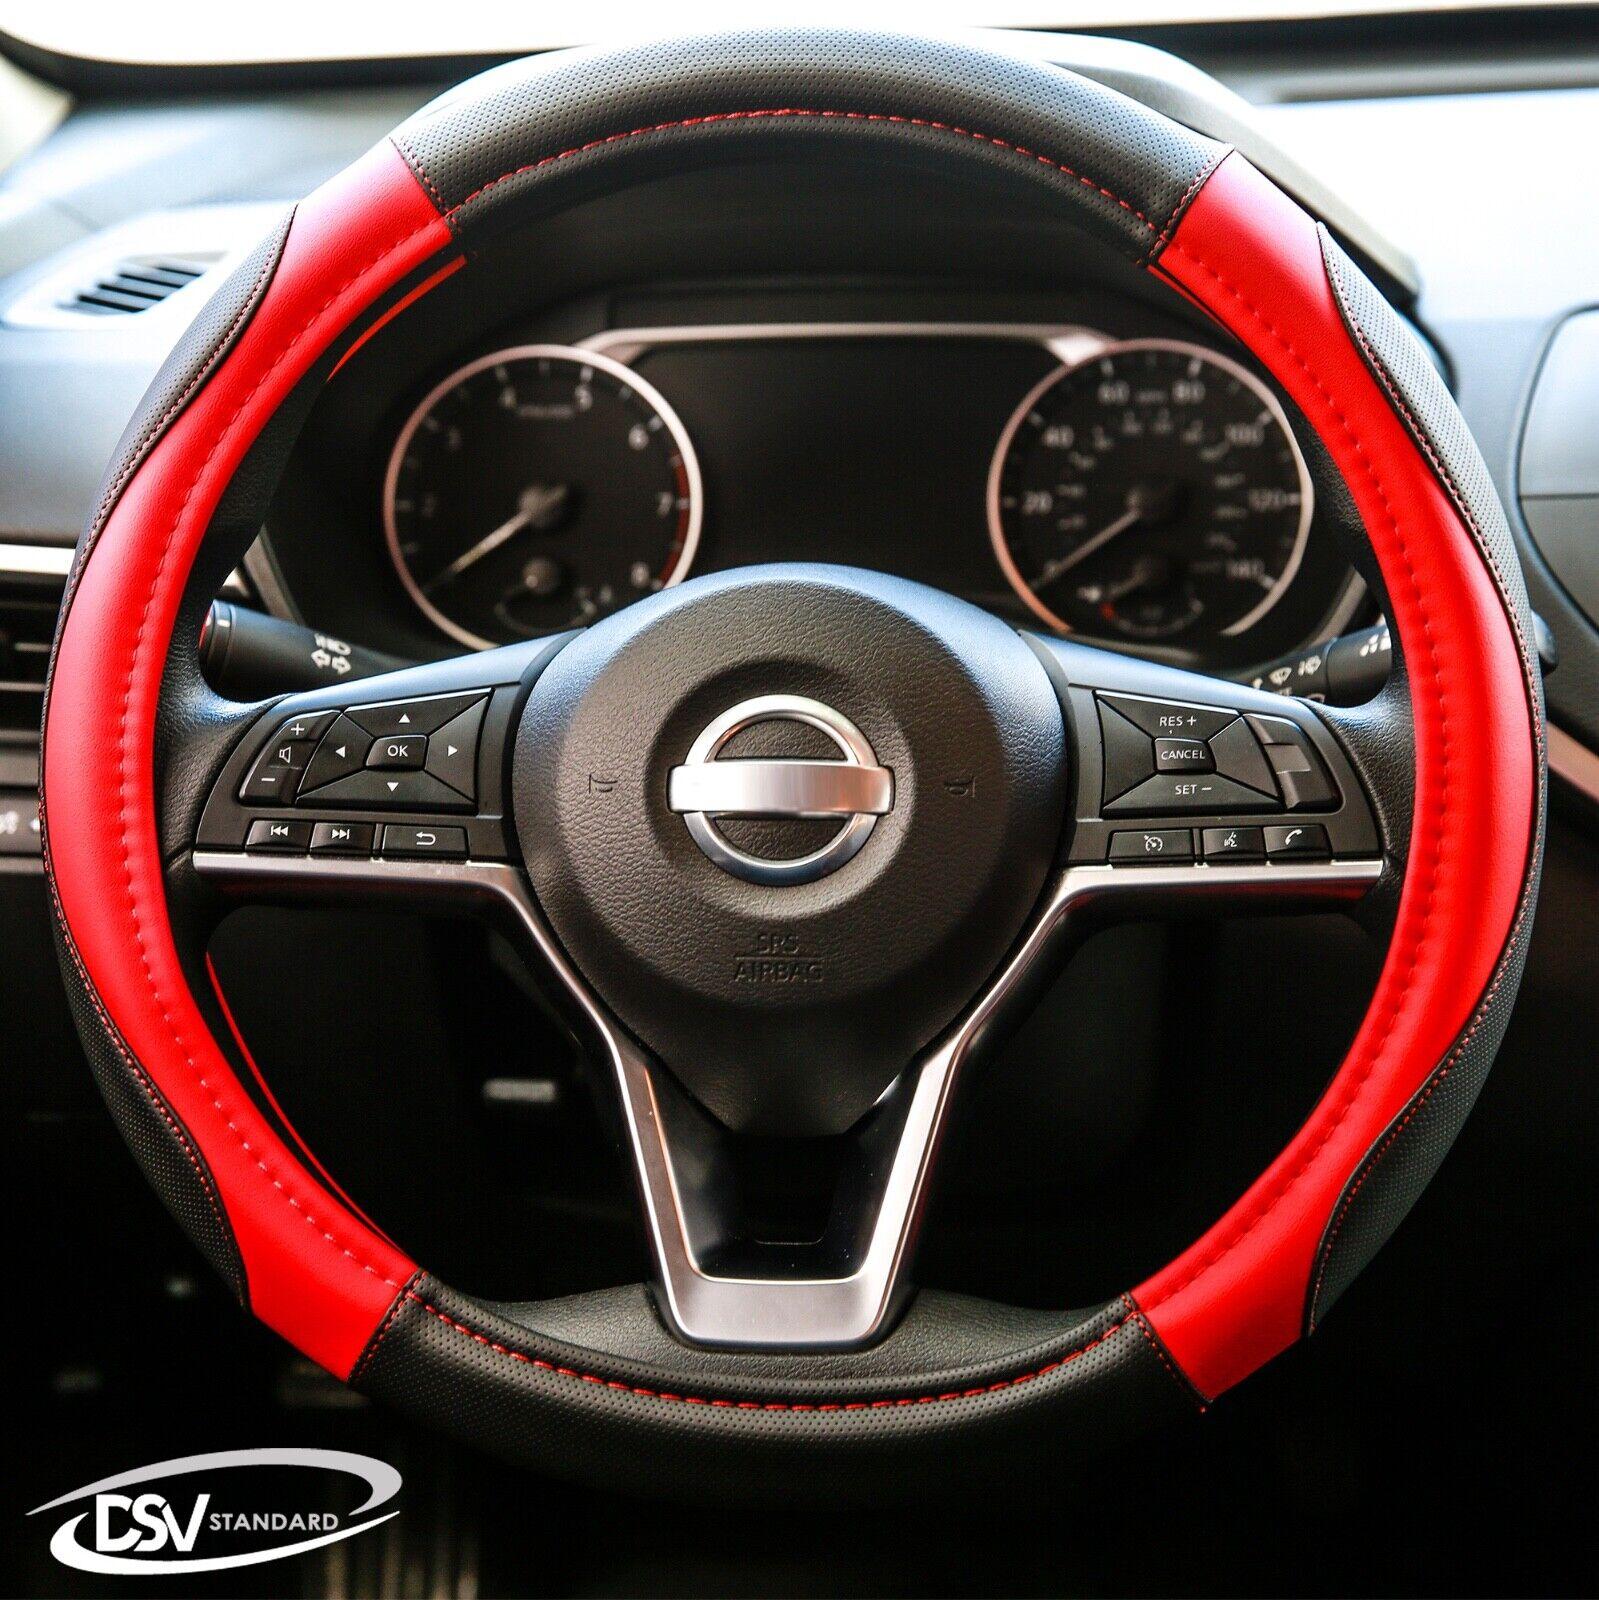 Pilot Alumni Group SWC-930 Leather Steering Wheel Cover Collegiate Georgia Bulldogs